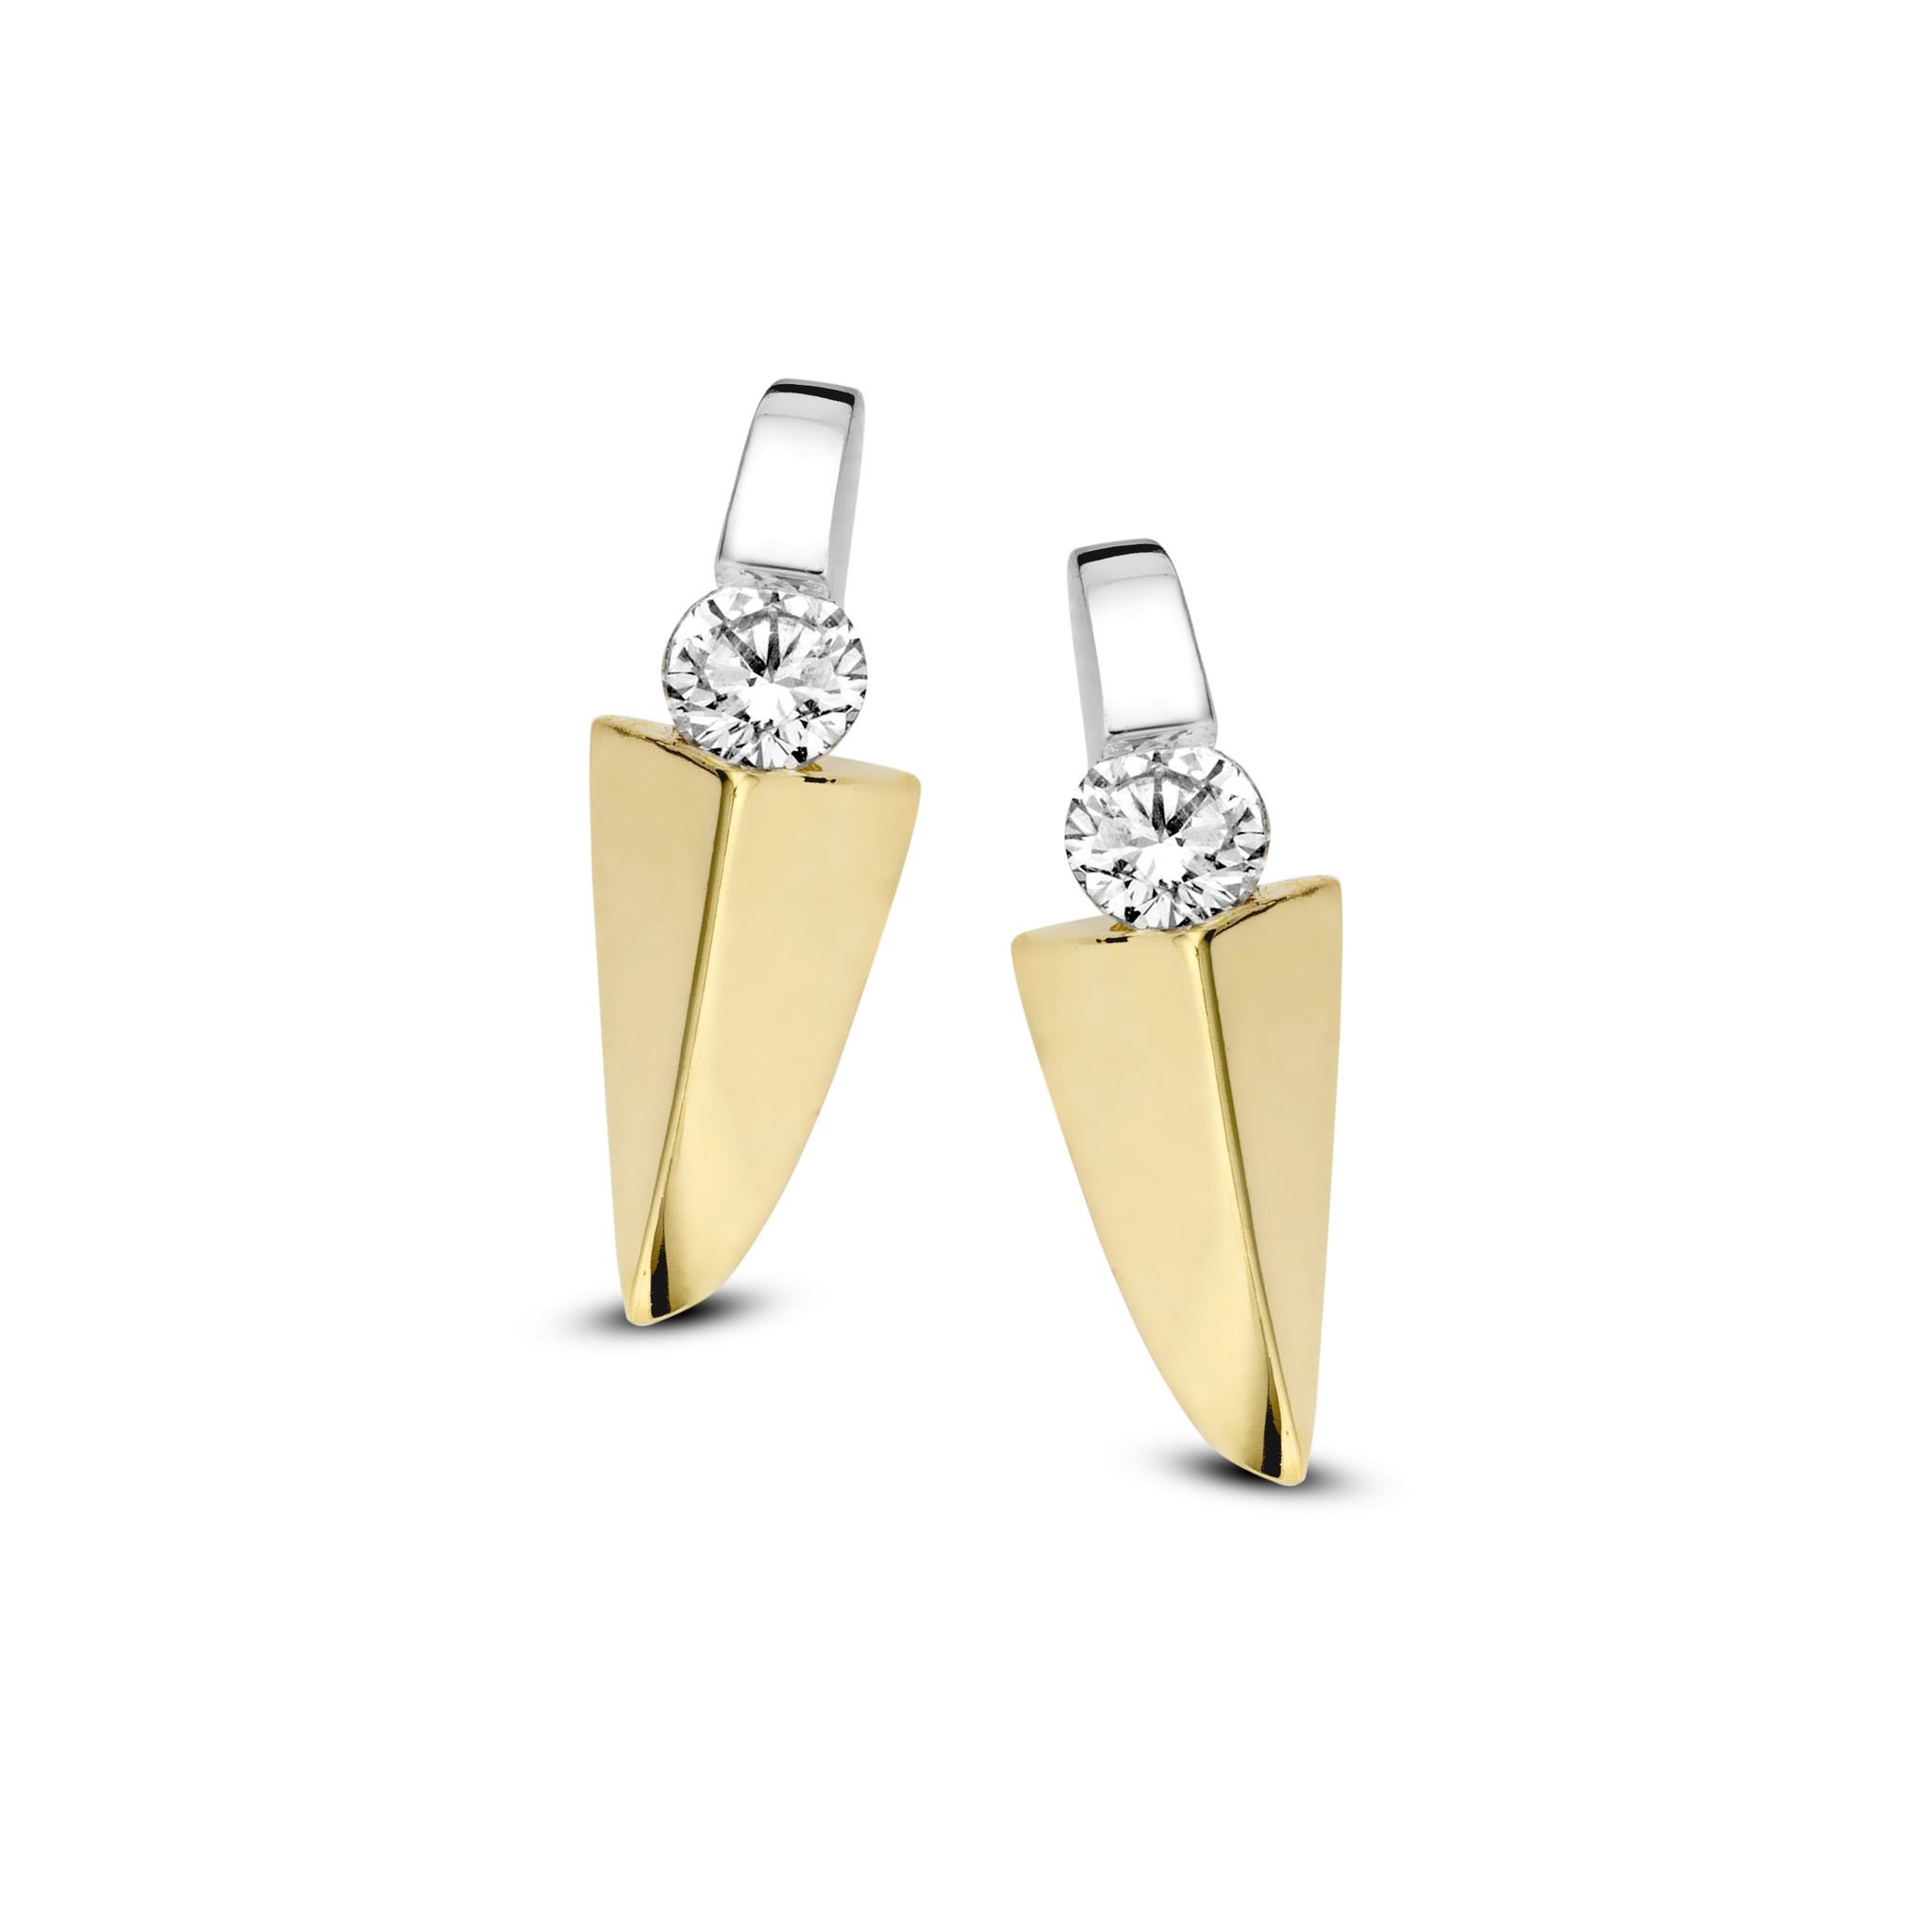 Private Label CvdK 14 krt.  gouden oorknoppen bicolor met diamant, briljant geslepen, totaal 0.18 ct.  G/VVSI